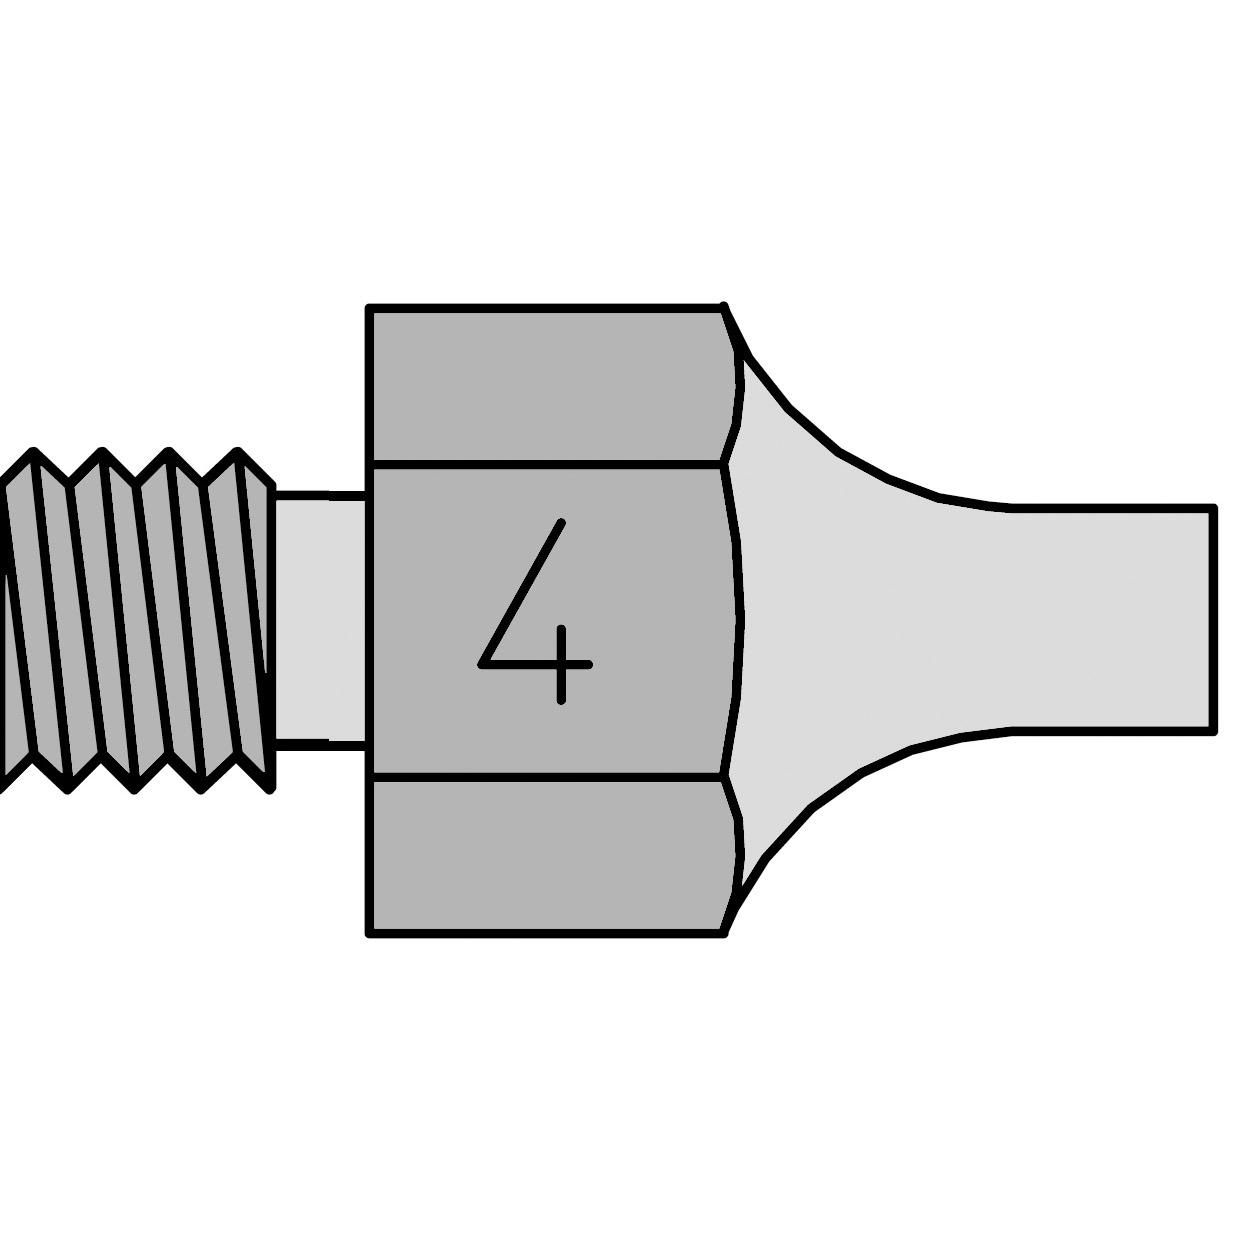 DS 114 Desoldering nozzle